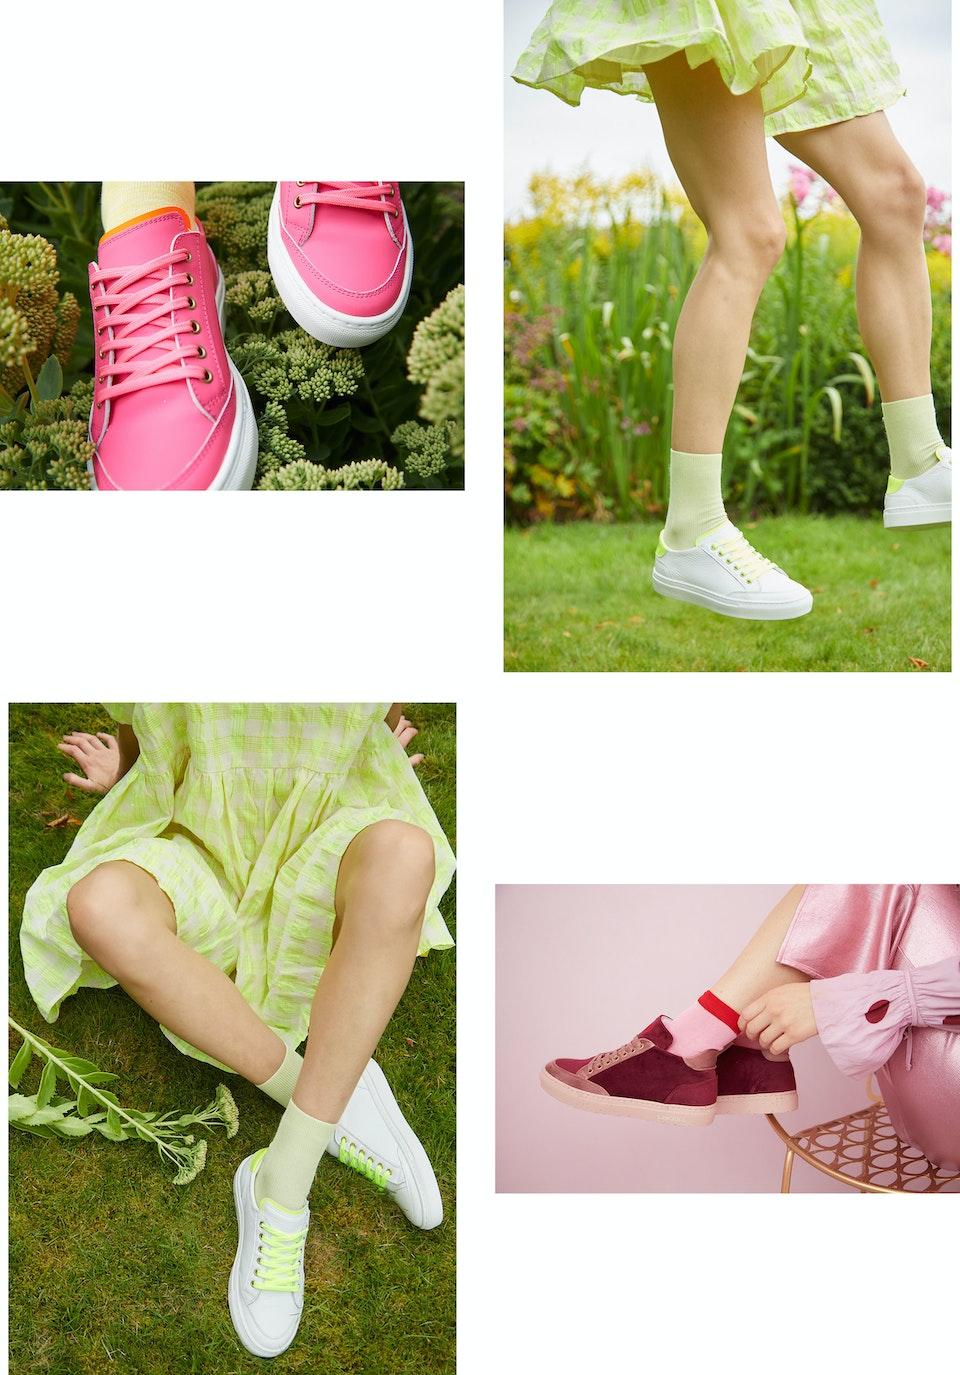 TaschkaShoes_012 -